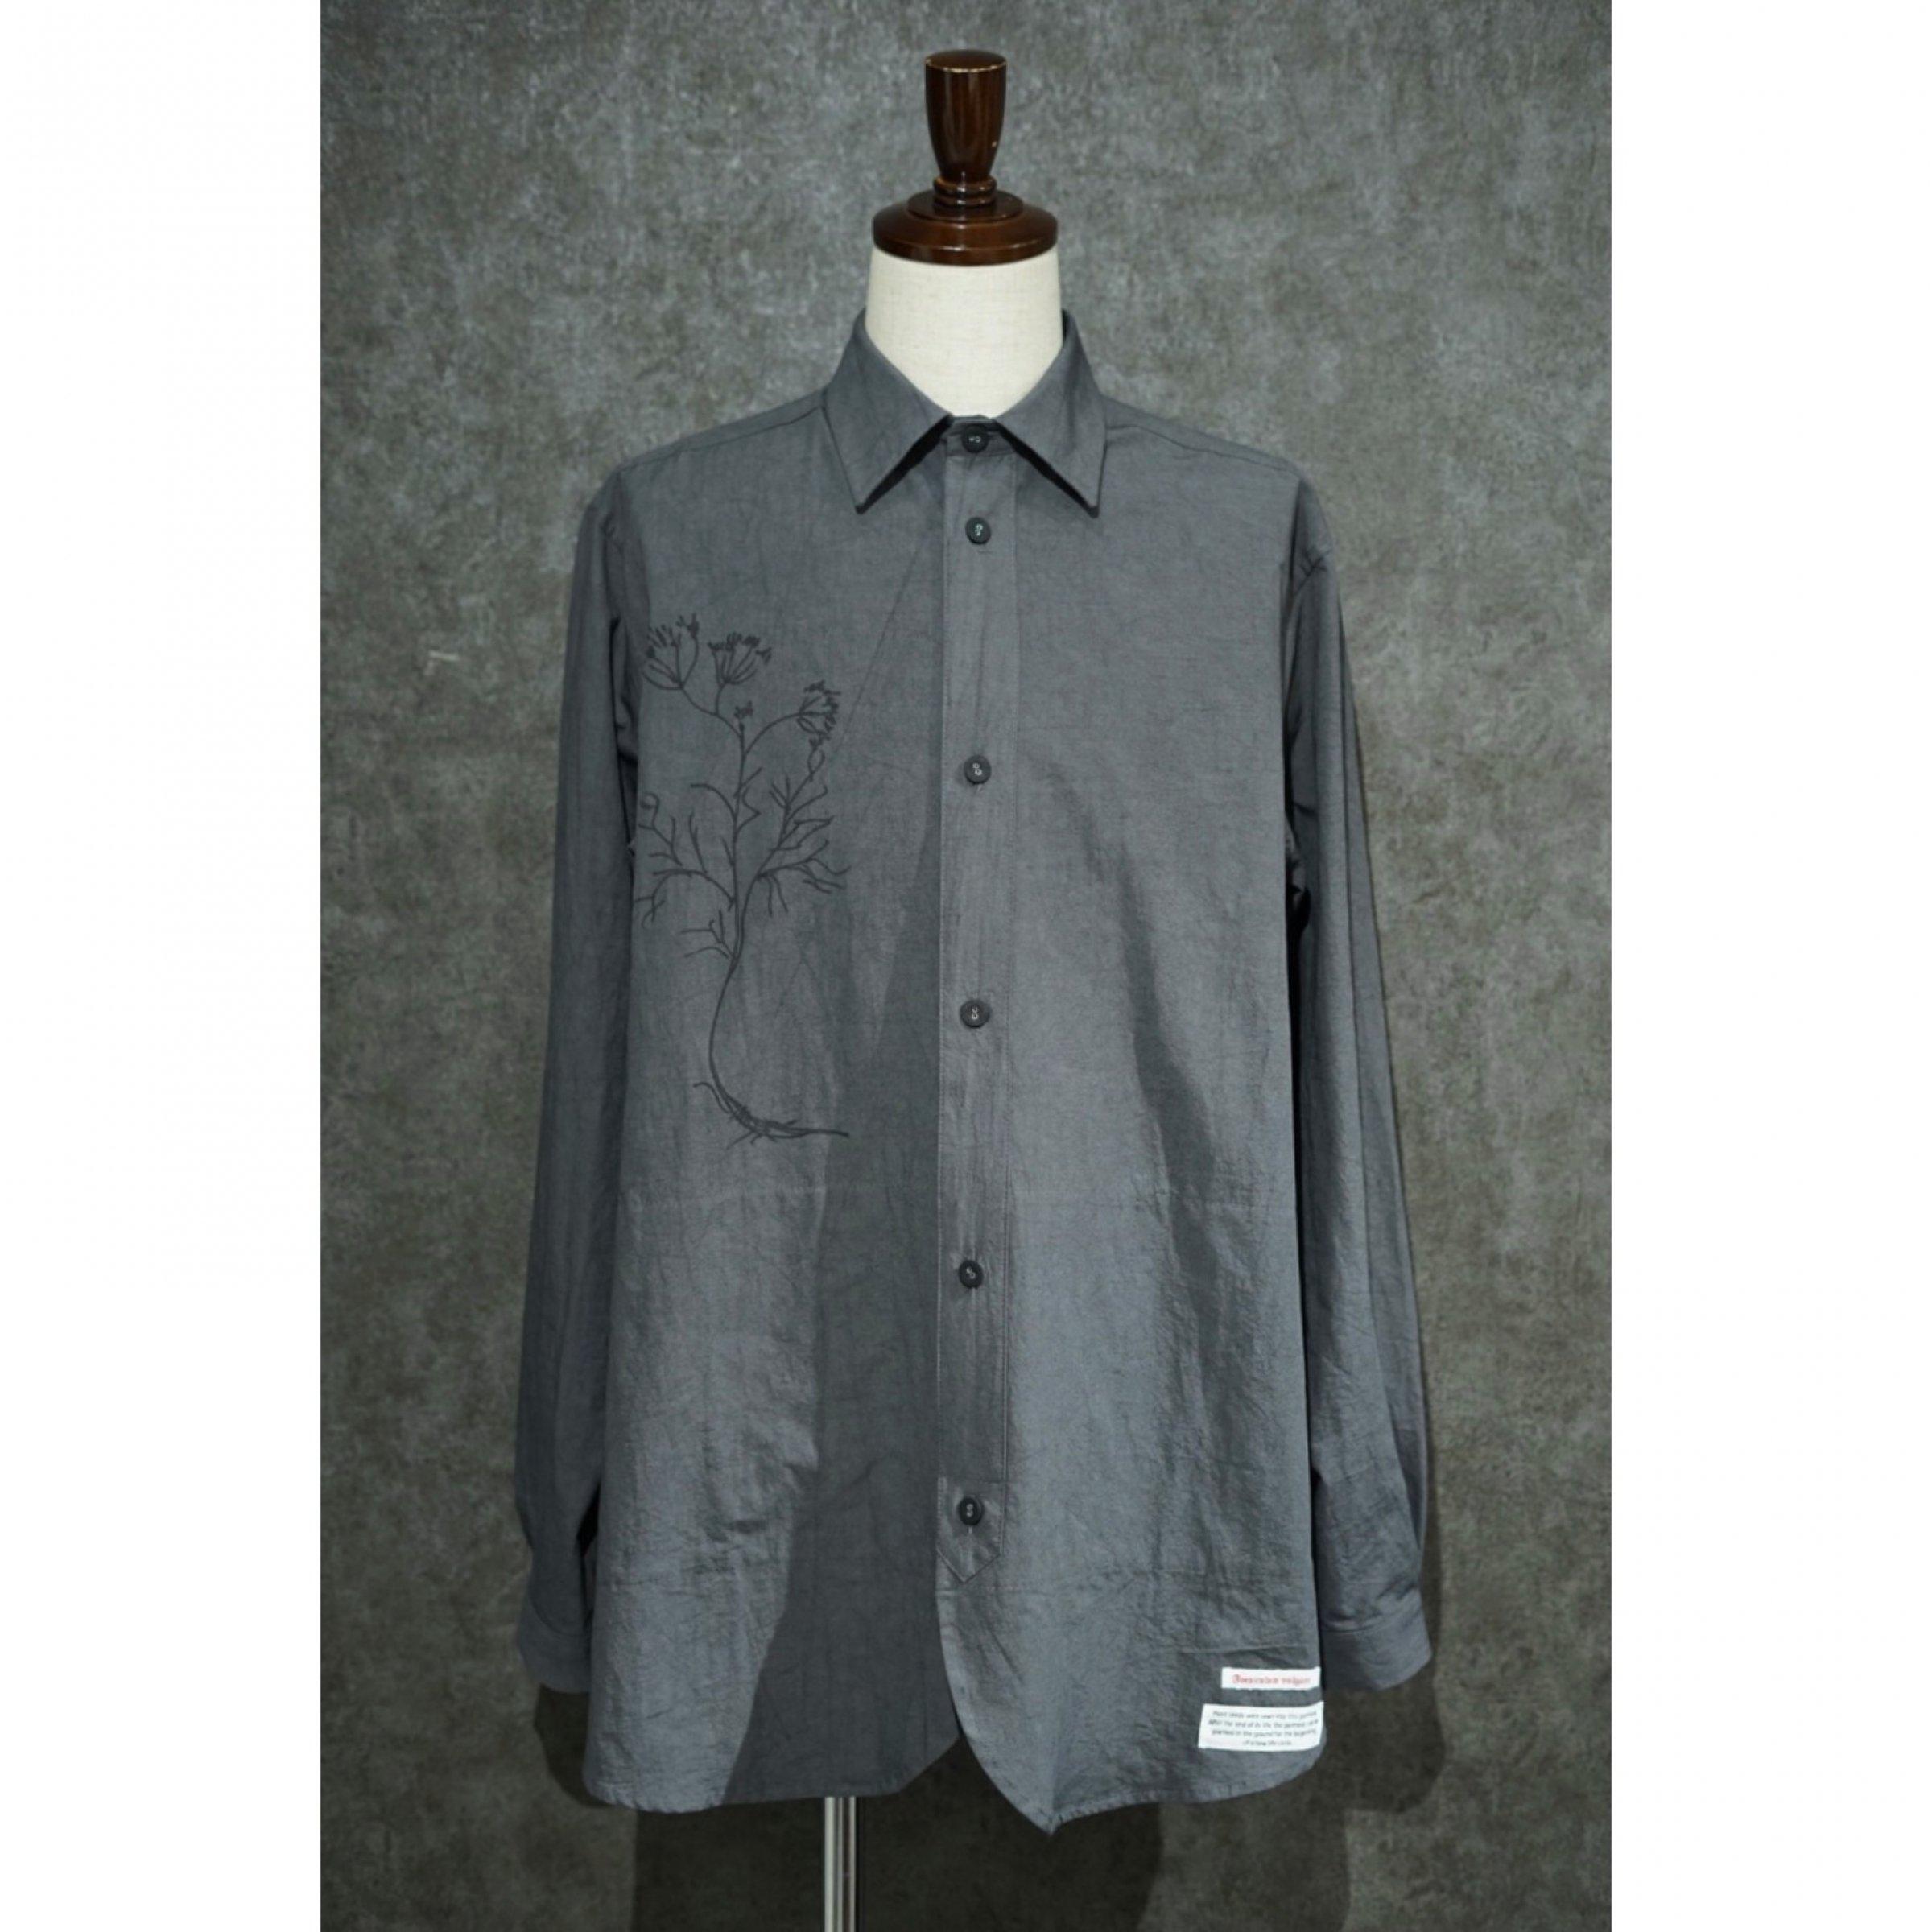 【FRANK LEDER】<br>コットン/リネン サイドポケットシャツ<br>withハンドドローイング